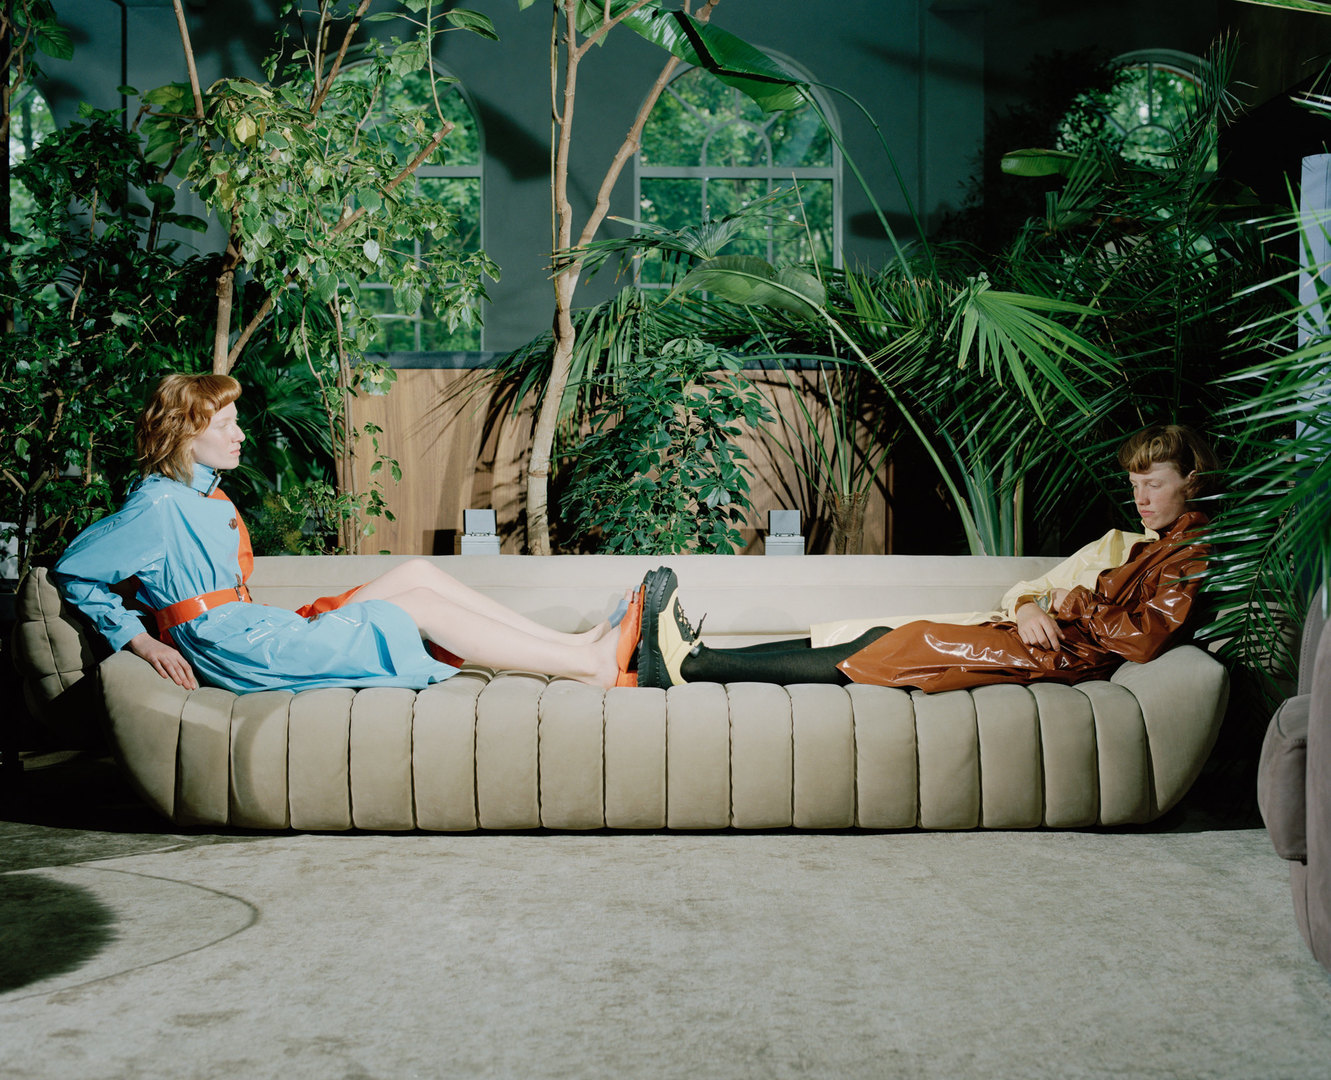 Плащ Mir Stores, обувь Camper. Baxter, диван Tactile Jan Kath, ковер Milano